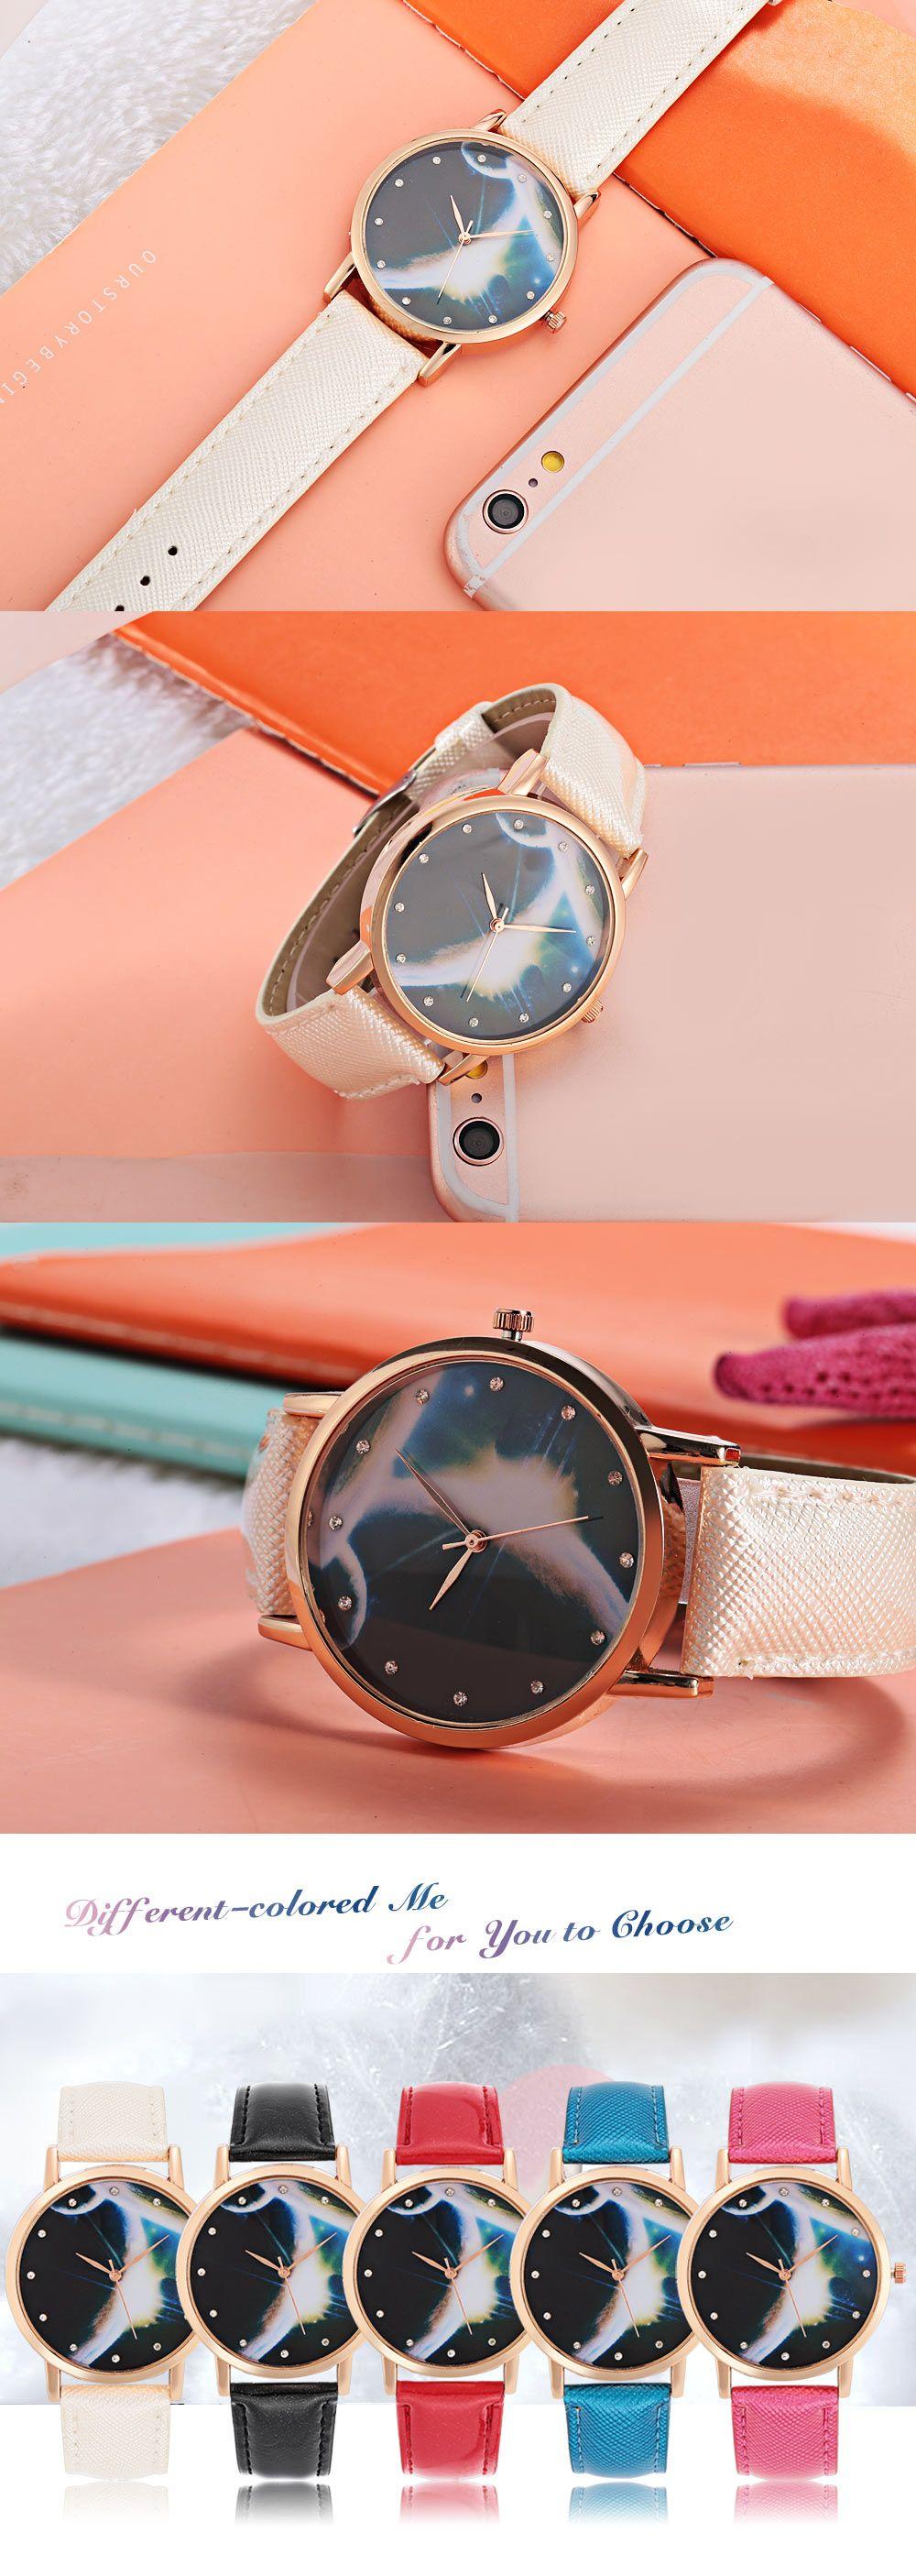 Vogue Women Quartz Watch Artificial Diamond Starry Sky Pattern Dial Leather Band Wristwatch